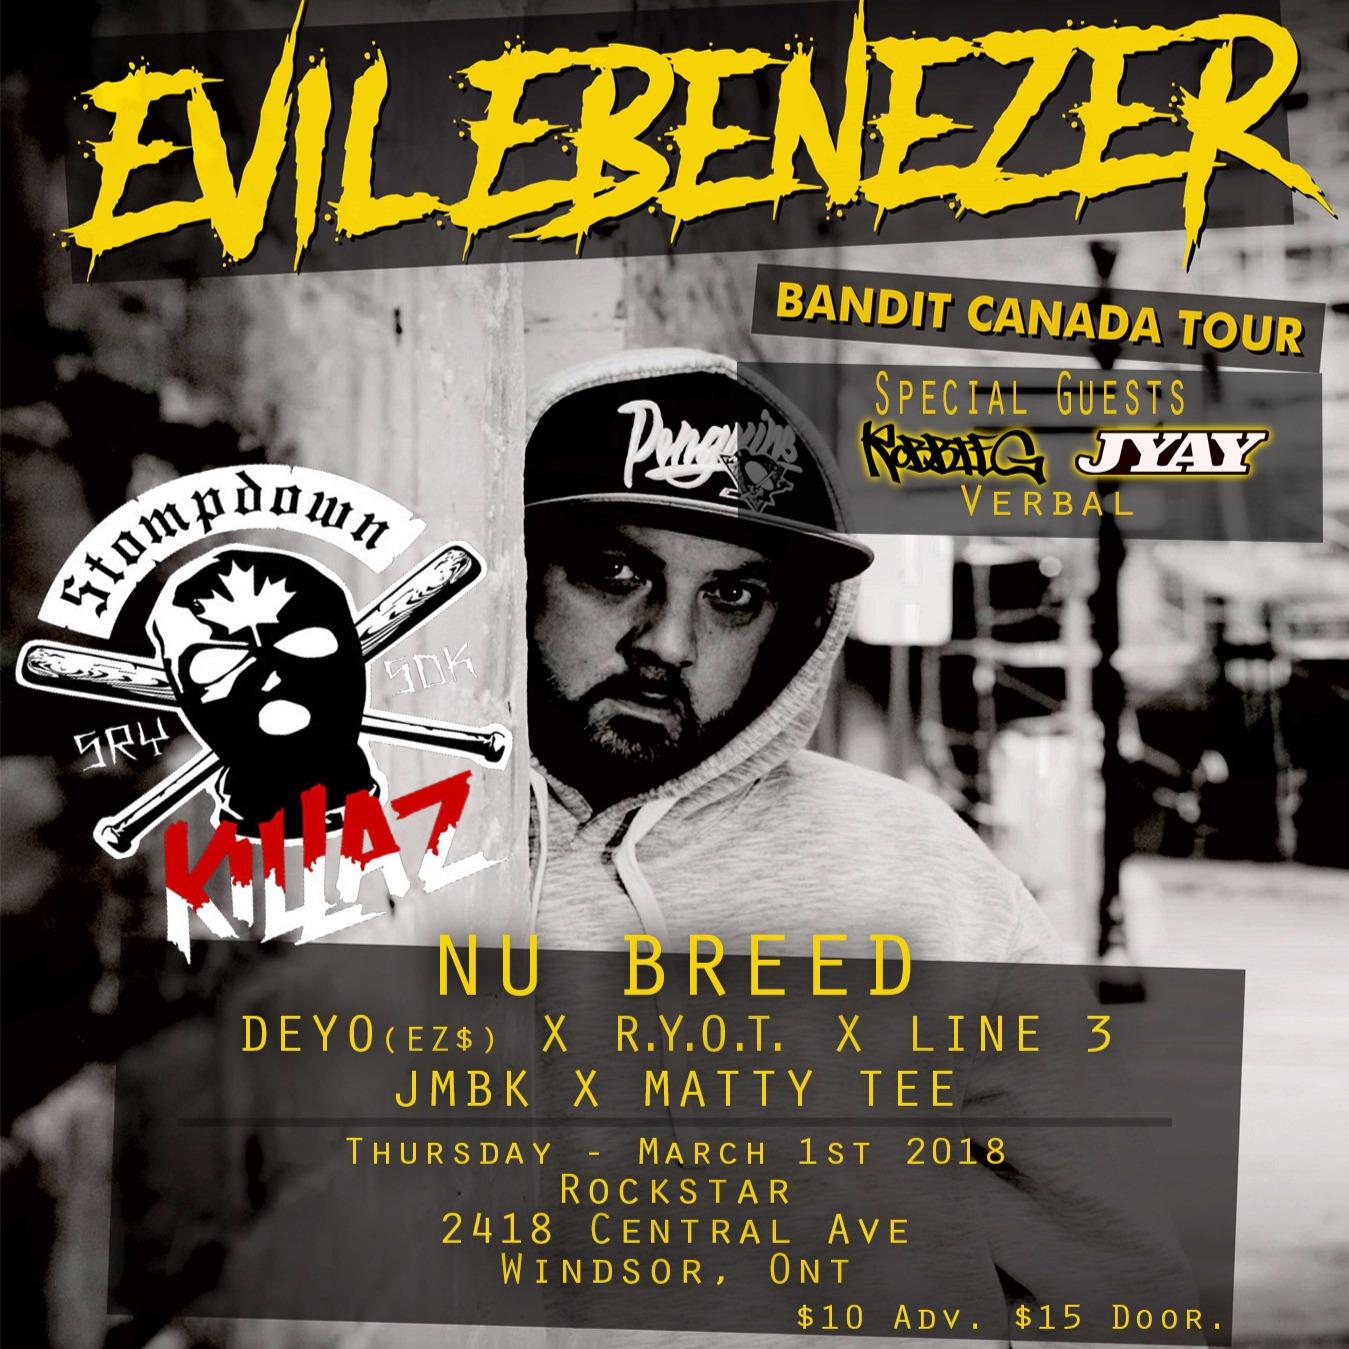 Evil Ebenezer W/ Nu Breed